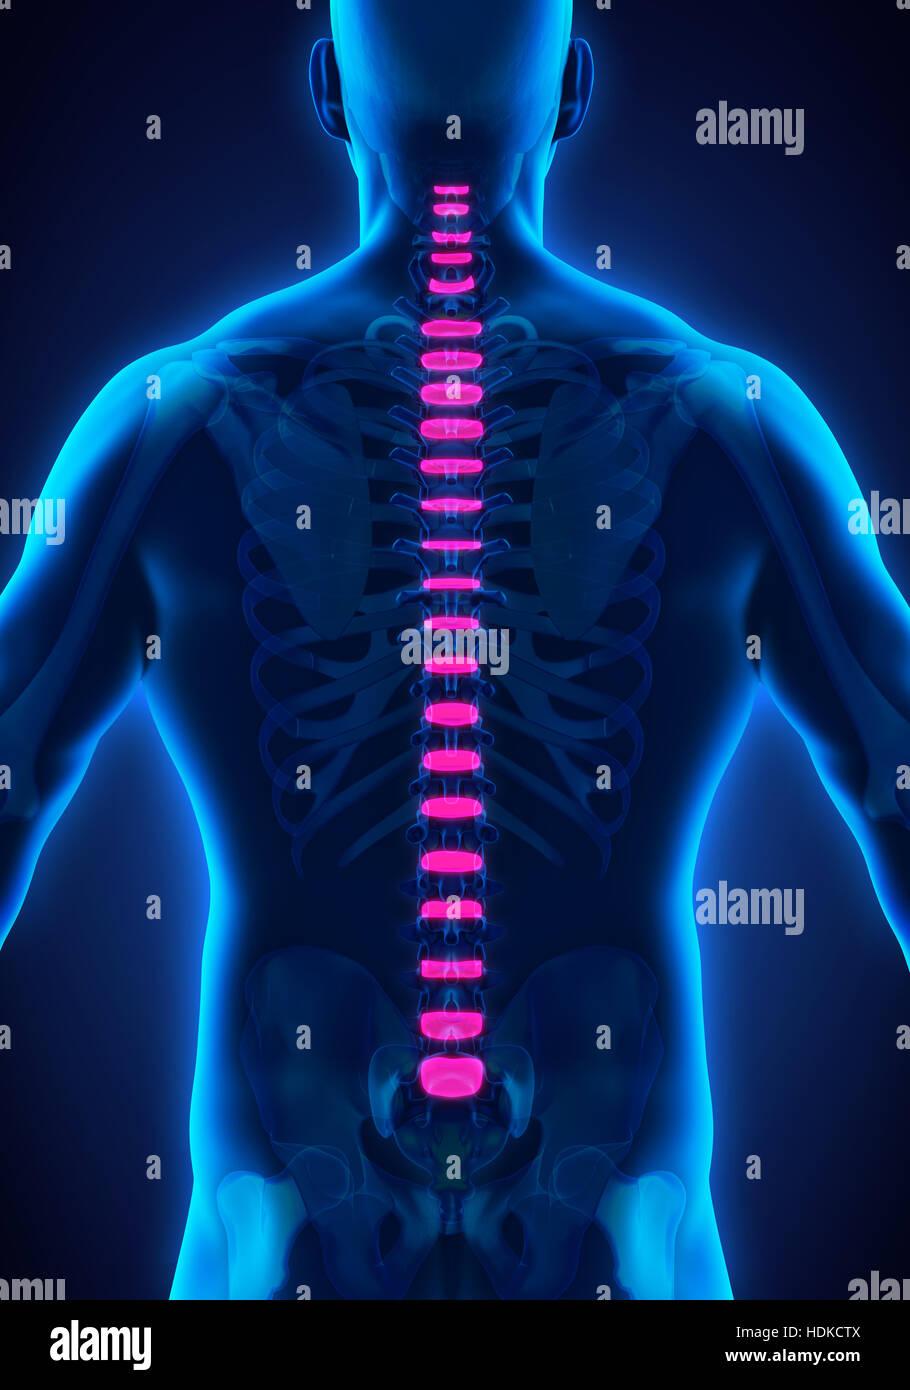 Columna vertebral Disco intervertebral Anatomía Foto & Imagen De ...